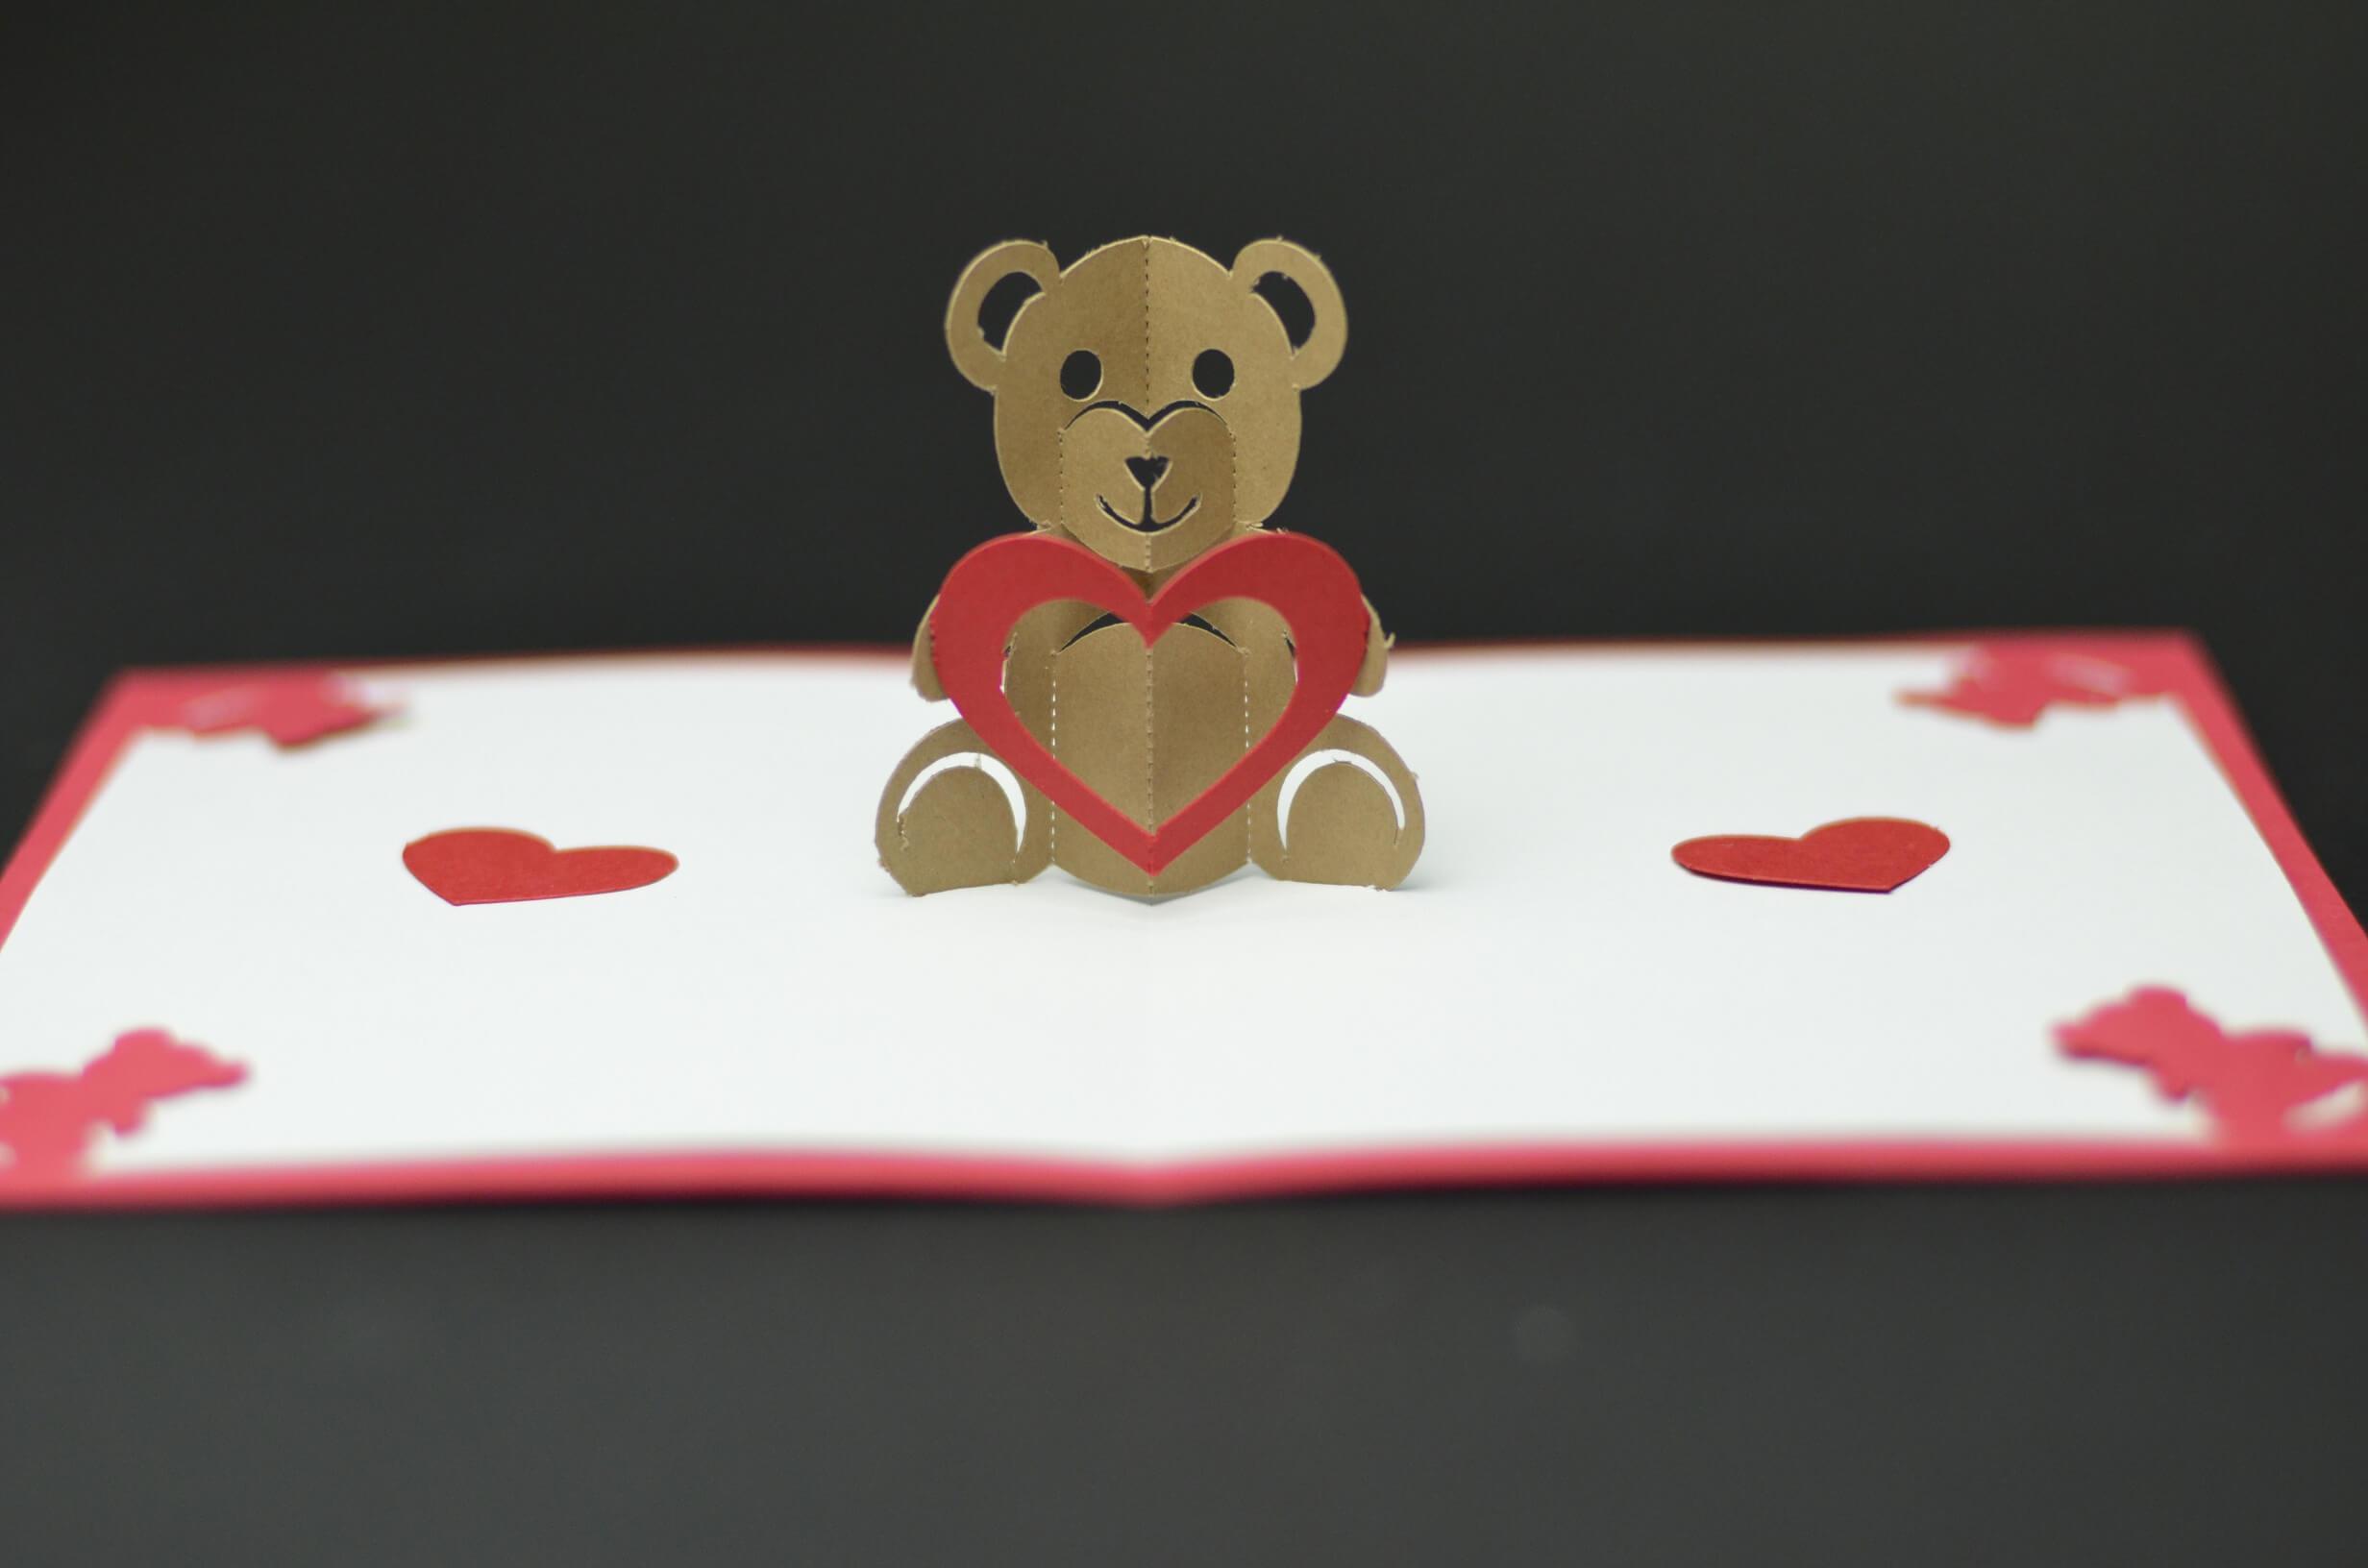 Pop Up Card Tutorials And Templates - Creative Pop Up Cards For Templates For Pop Up Cards Free